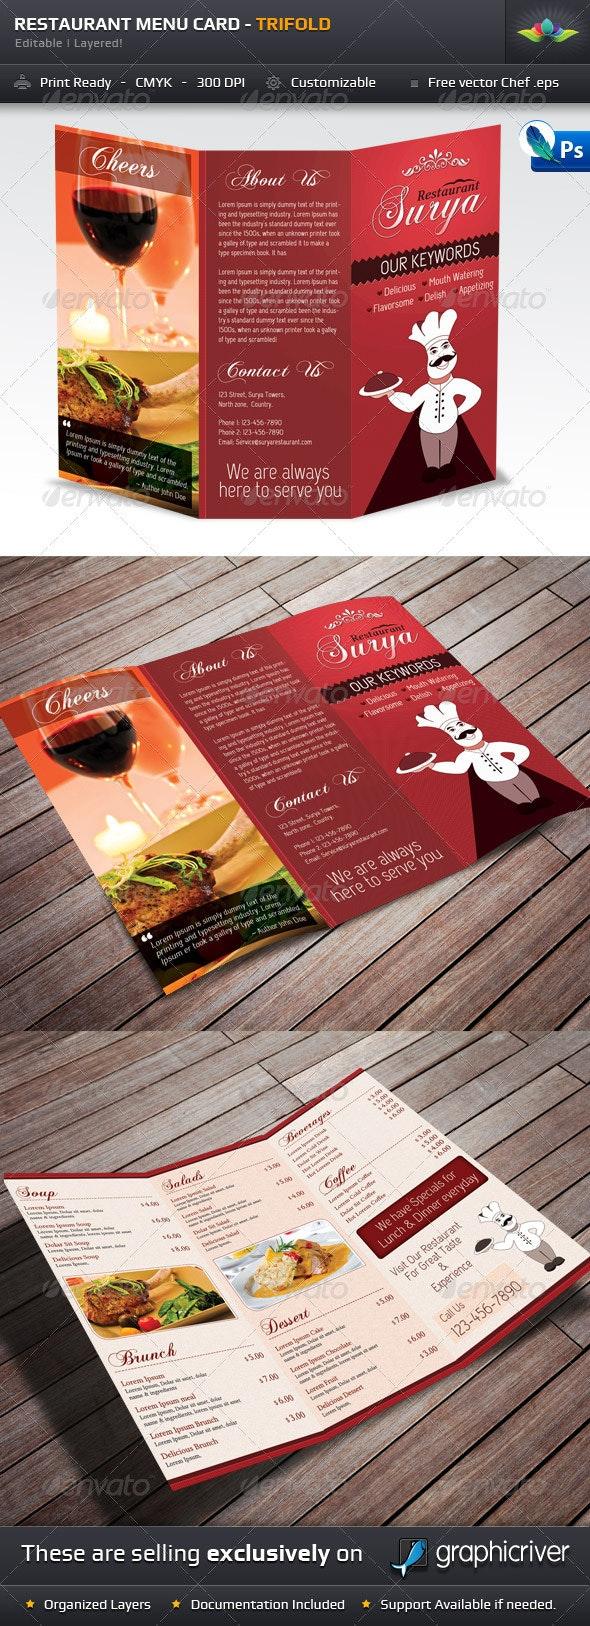 Restaurant Menu Card - TriFold - Food Menus Print Templates